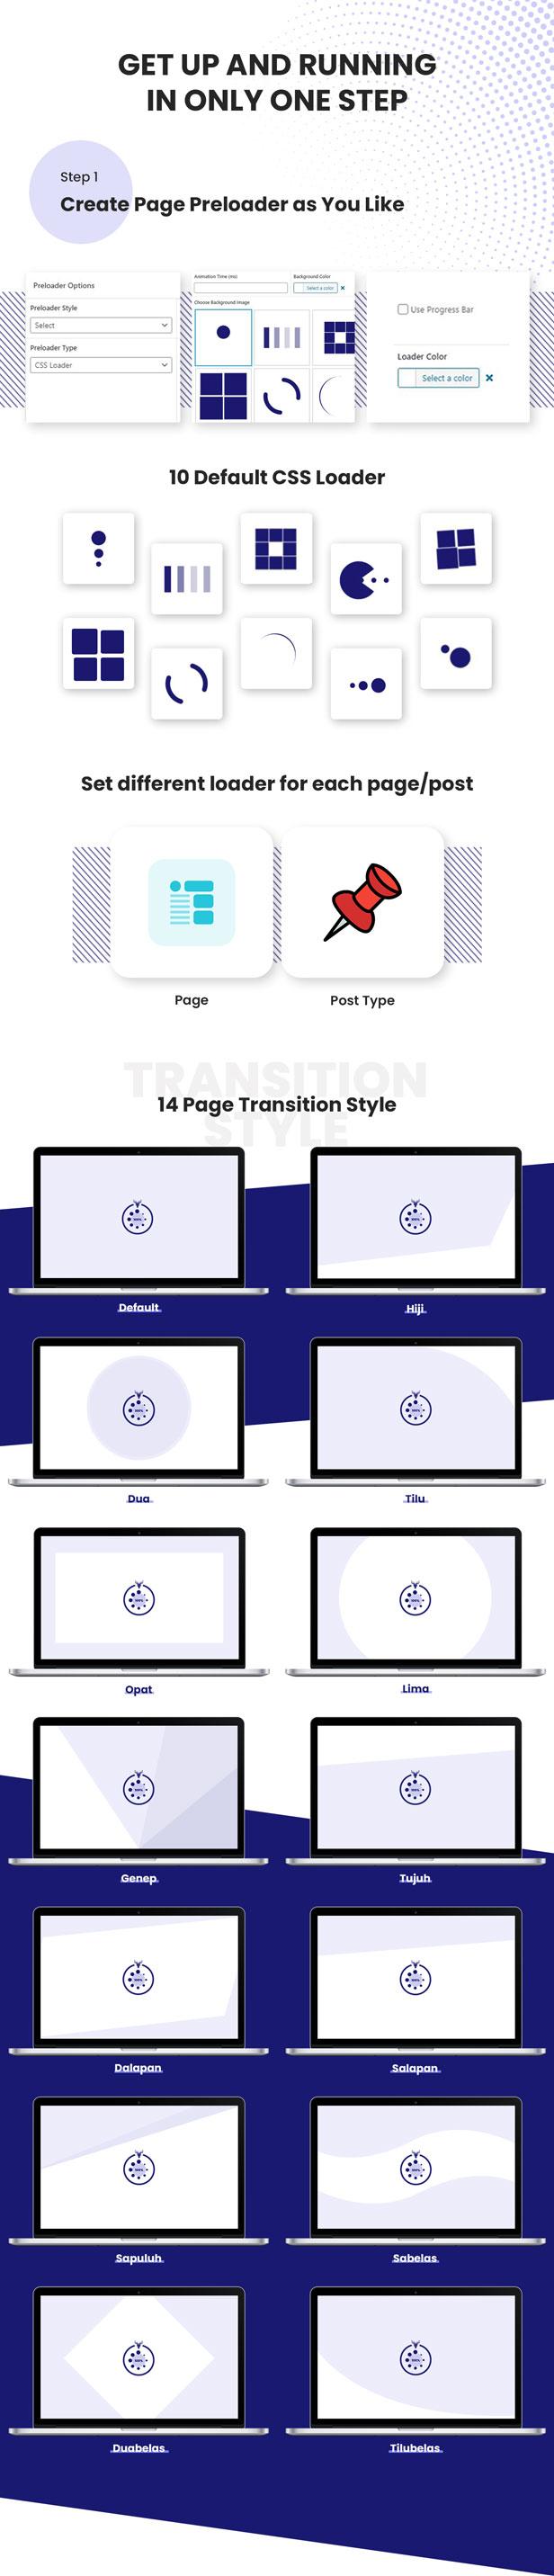 Preloader Plugin In WordPress - Preloader Awesome Pro - 4